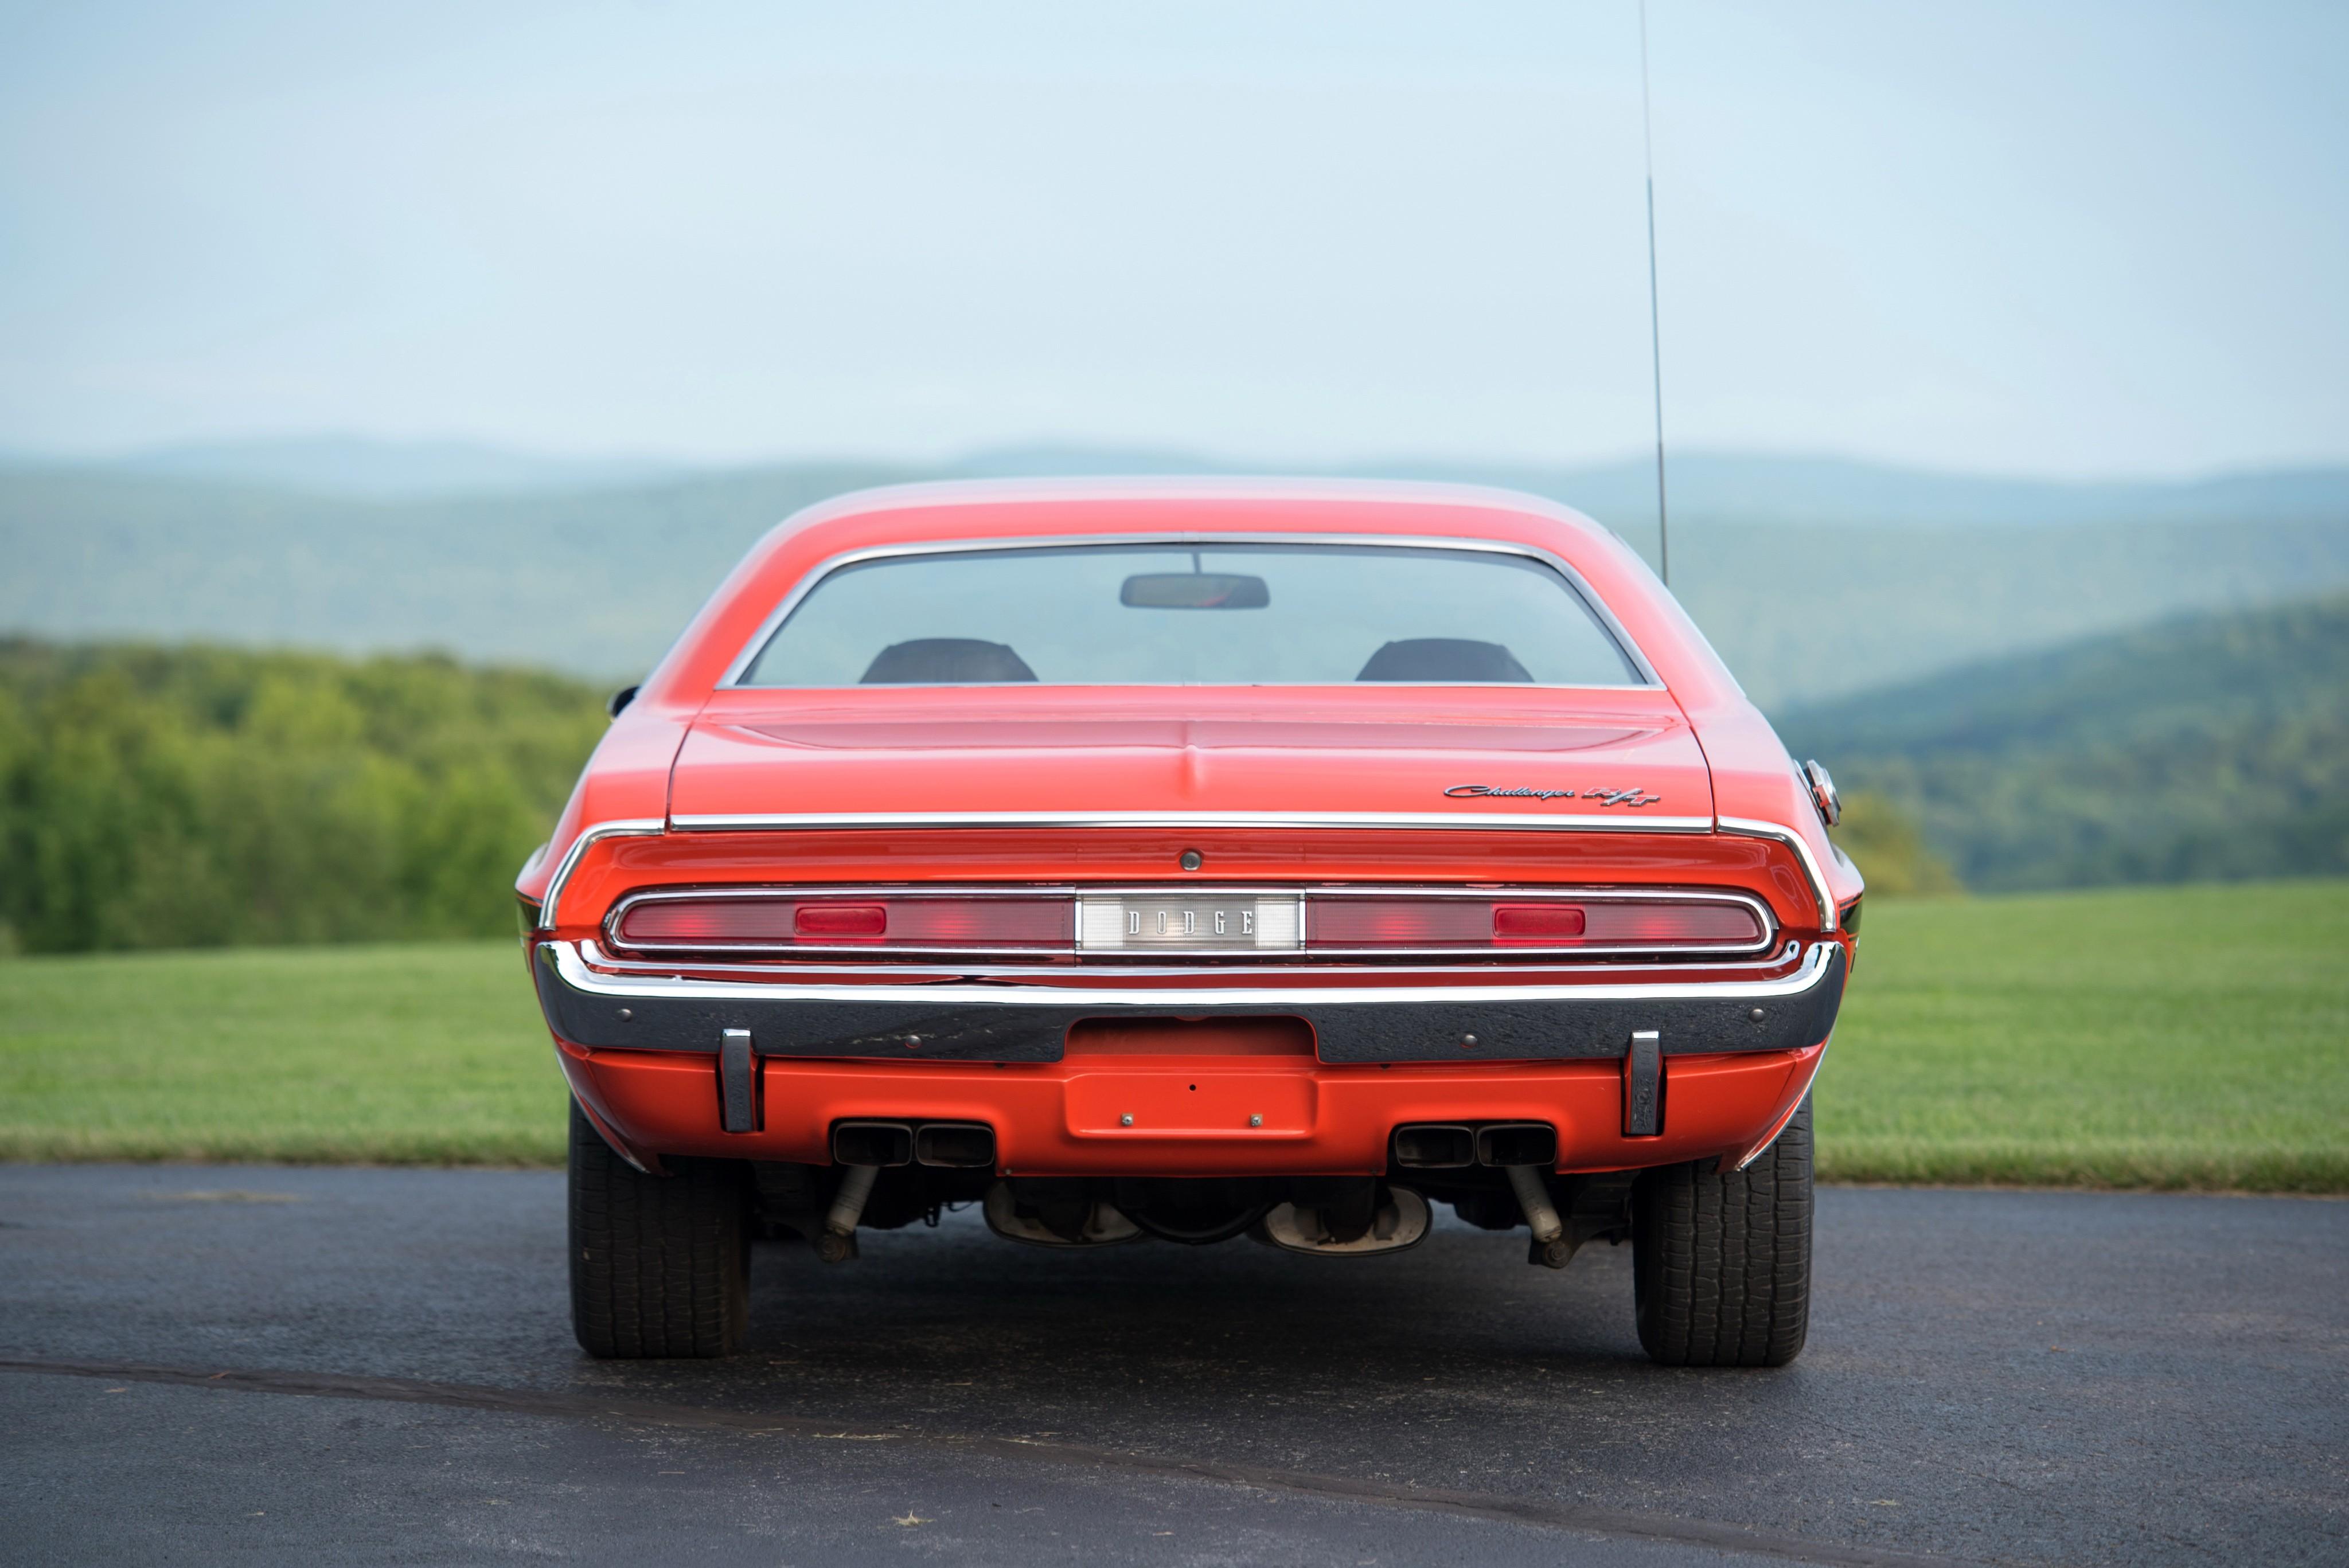 New Dodge Charger >> DODGE Challenger specs - 1969, 1970, 1971, 1972, 1973 ...